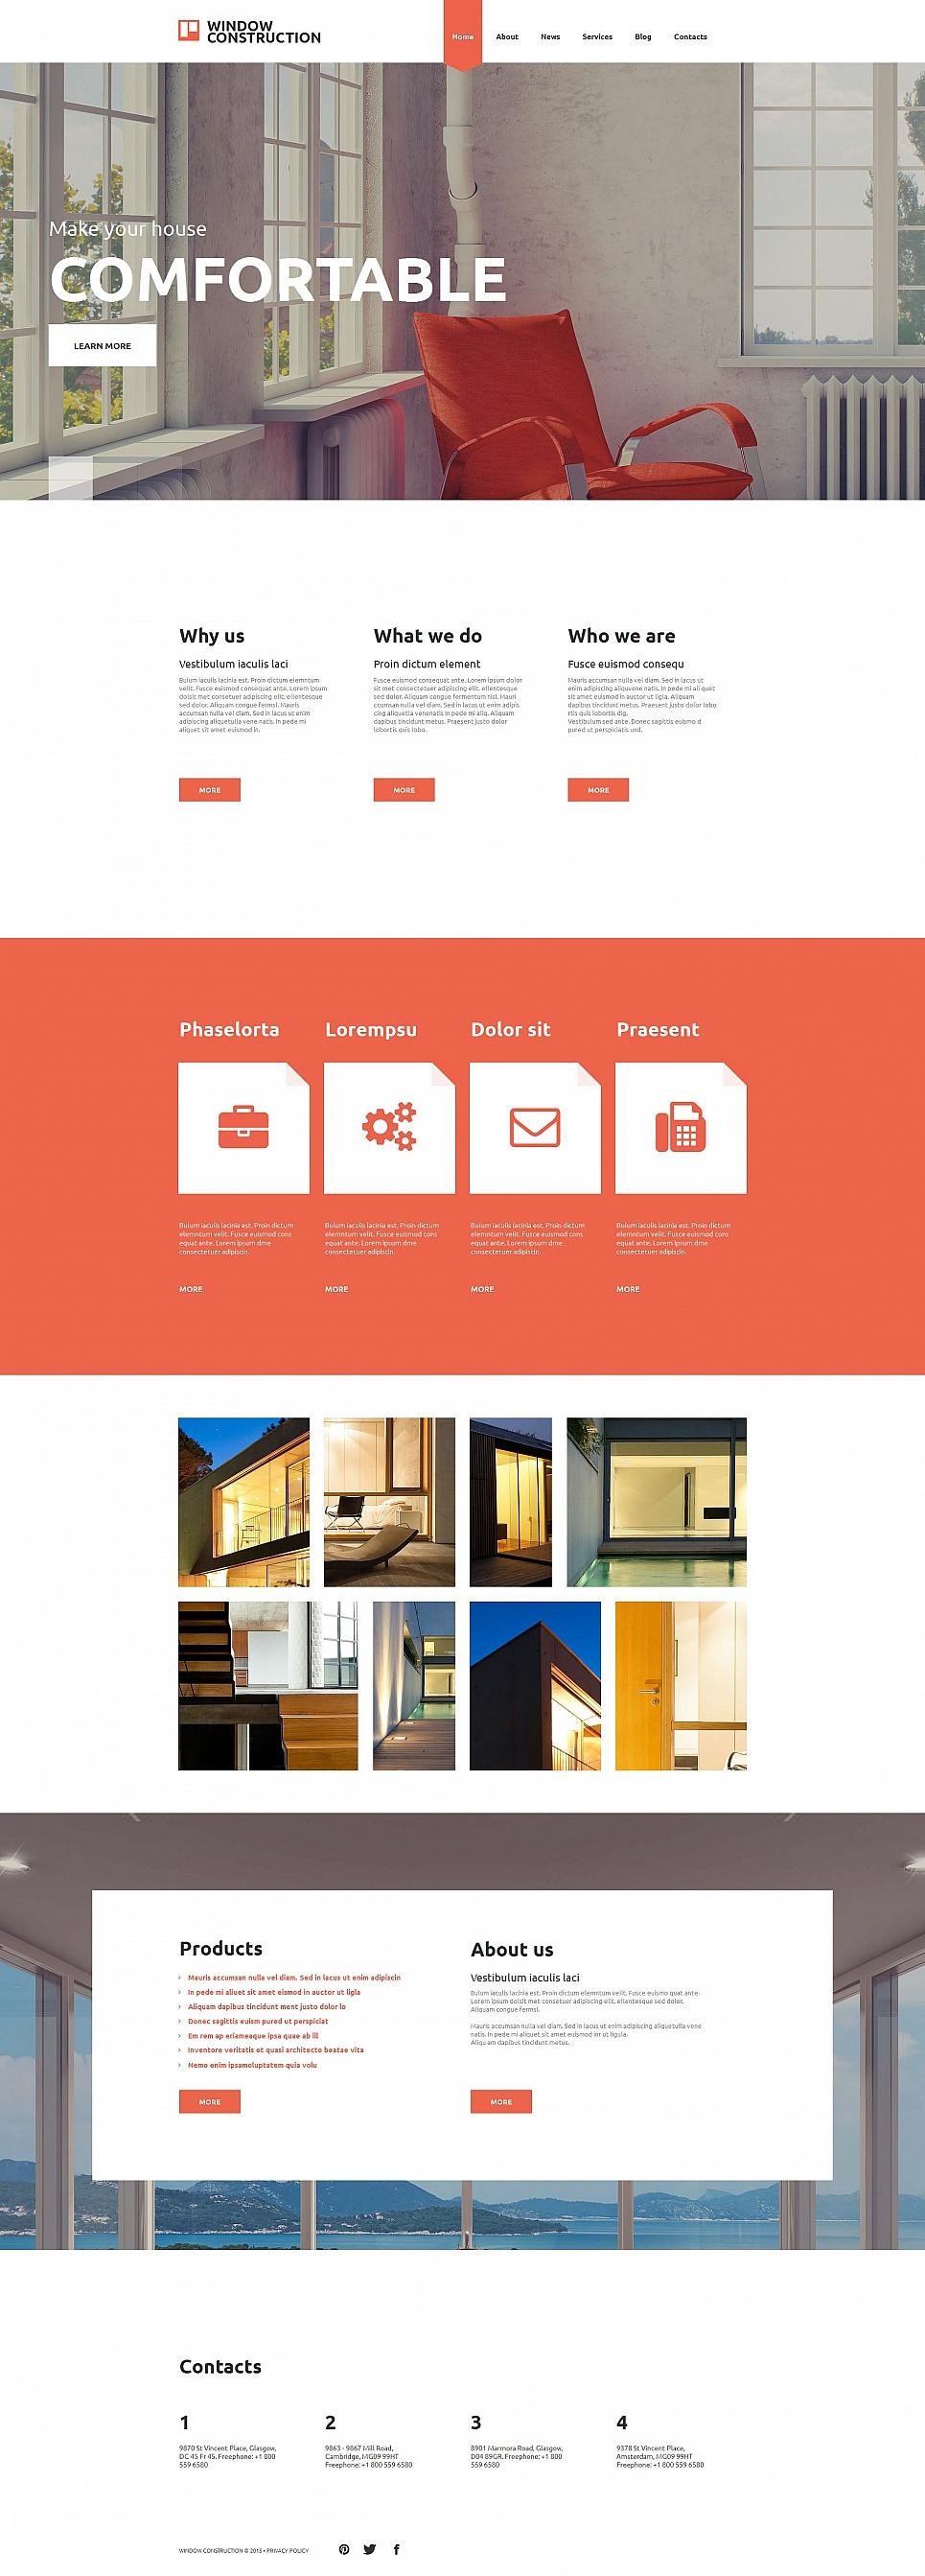 Windows manufacturing website design